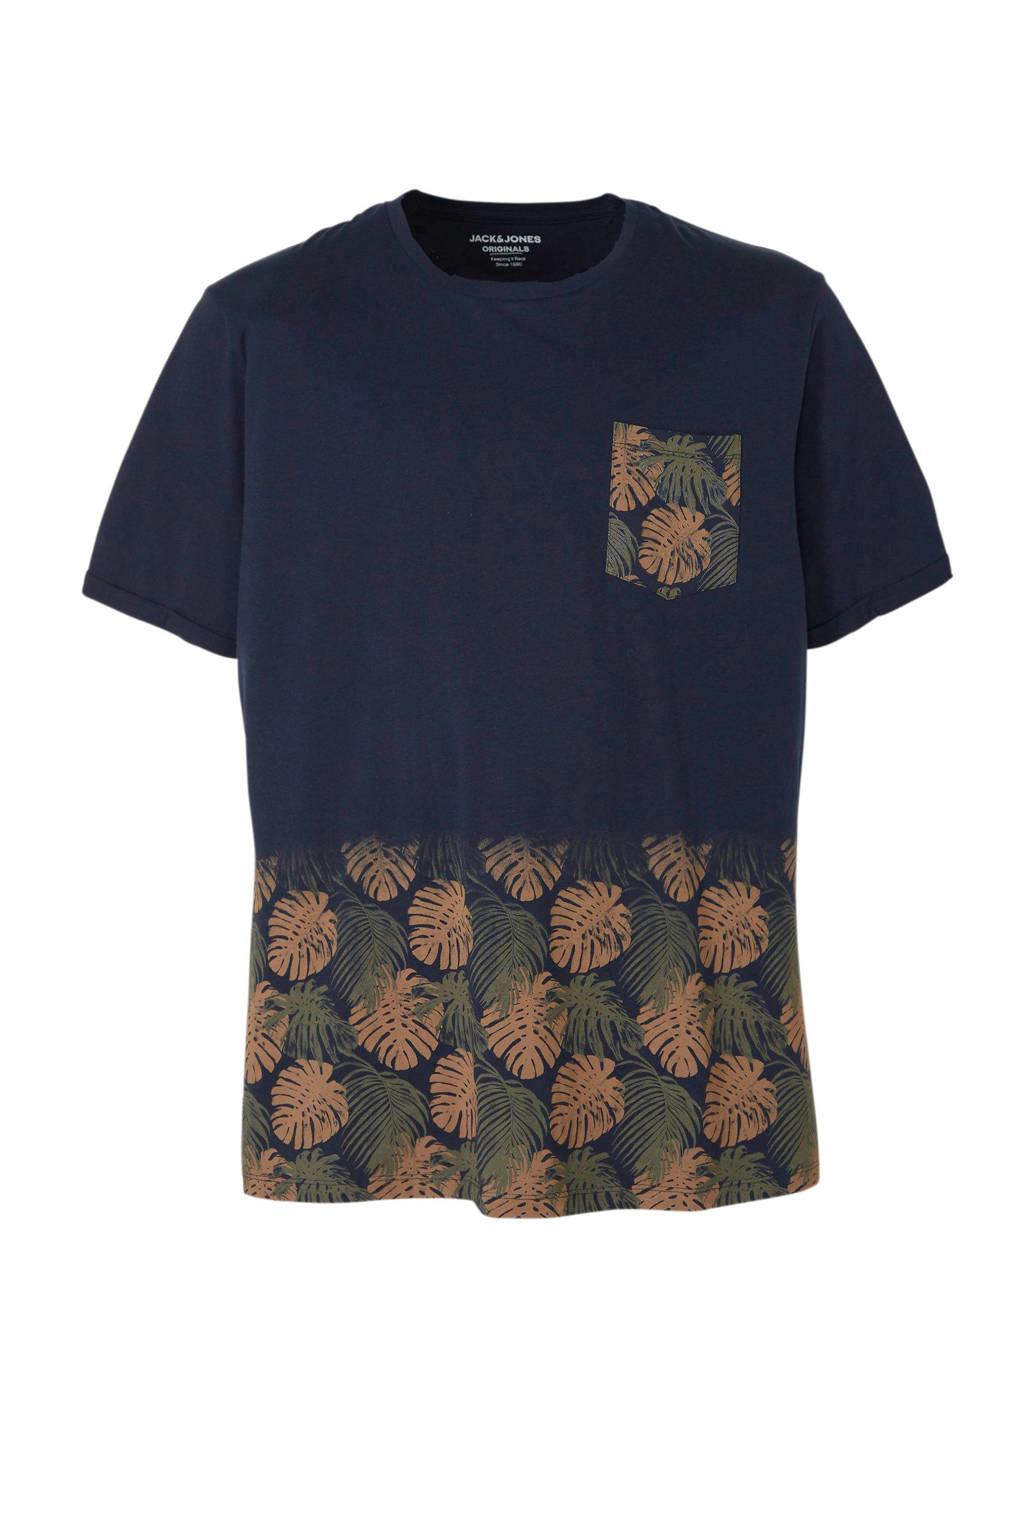 Jack & Jones Plus Size T-shirt, Donkerblauw